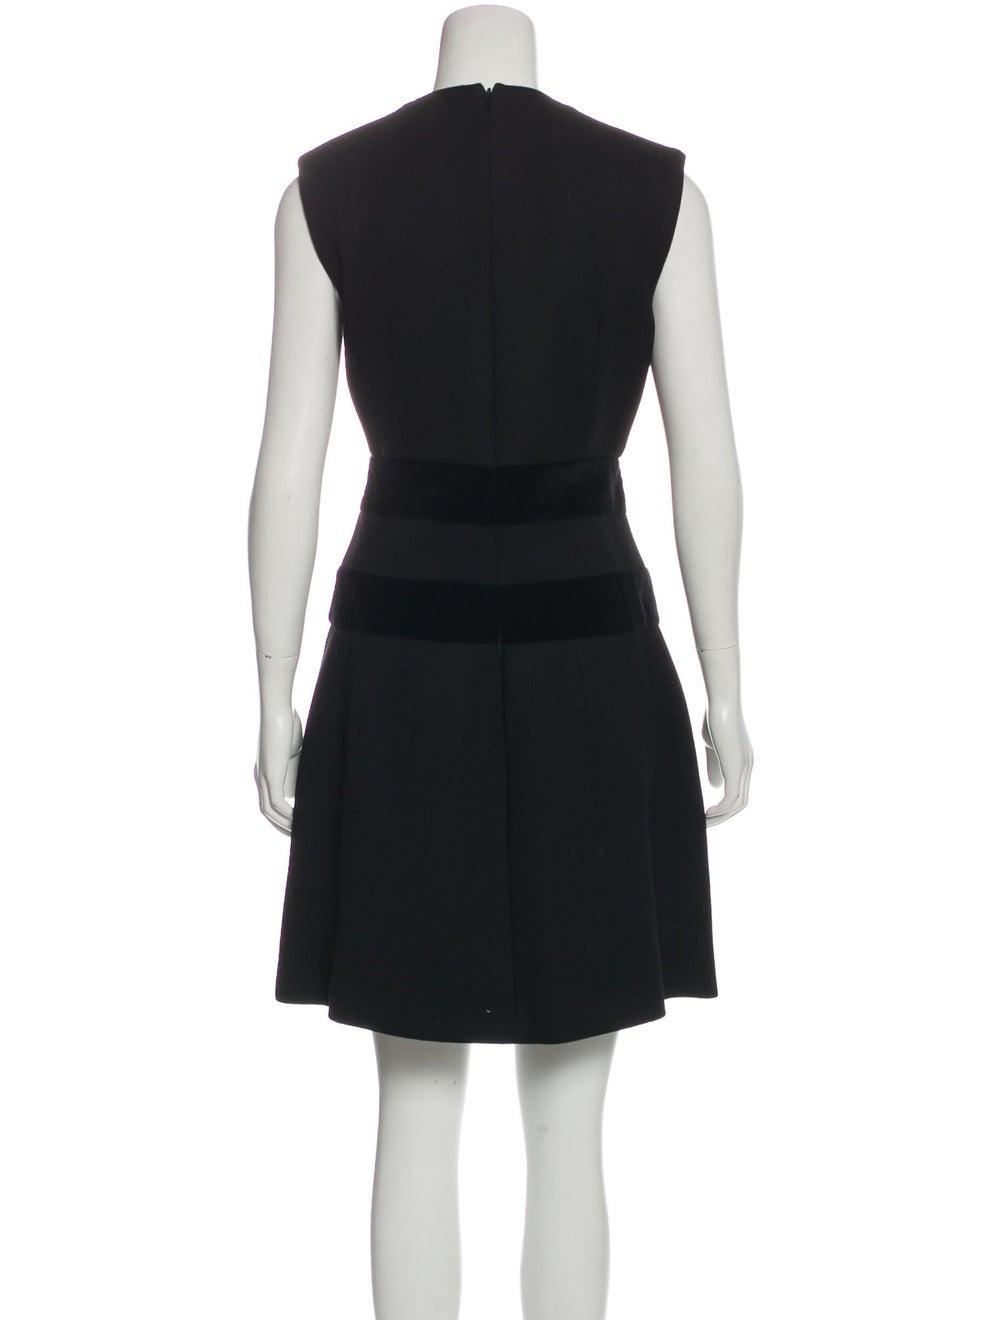 Alexander McQueen Sleeveless Flared Dress Black - image 3